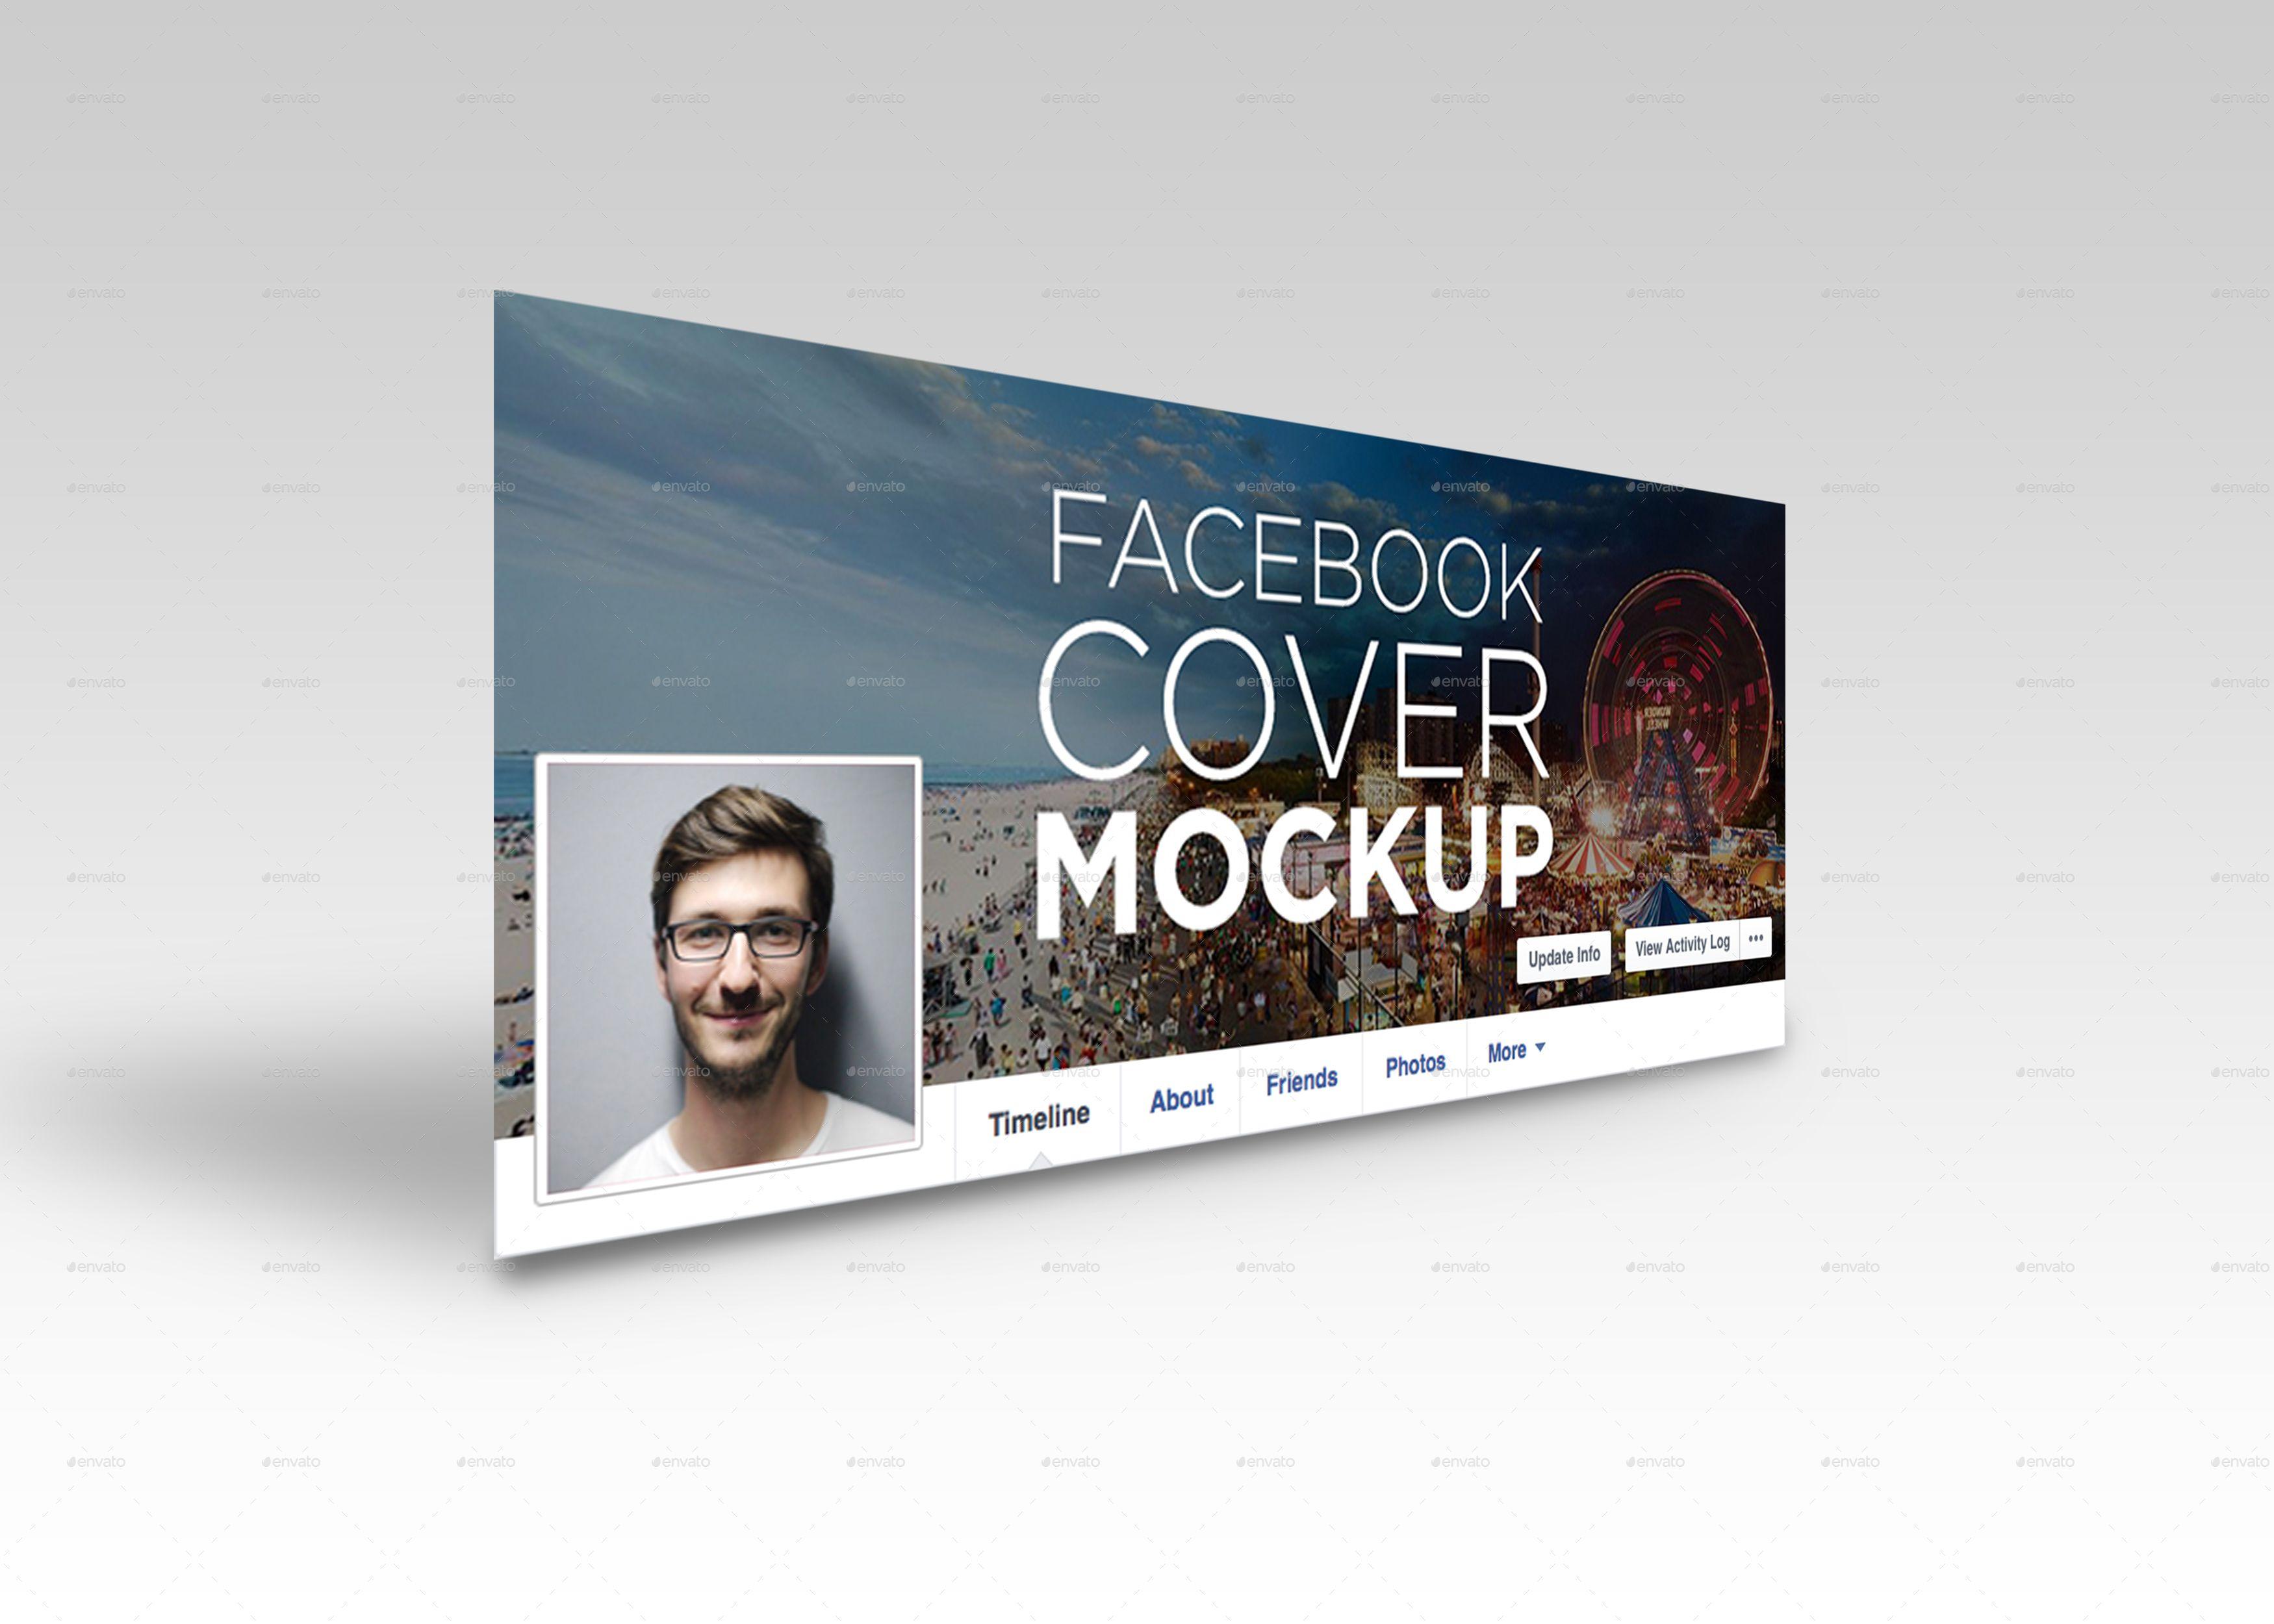 Facebook Cover Mockup Facebook Cover Facebook Timeline Covers Mockup